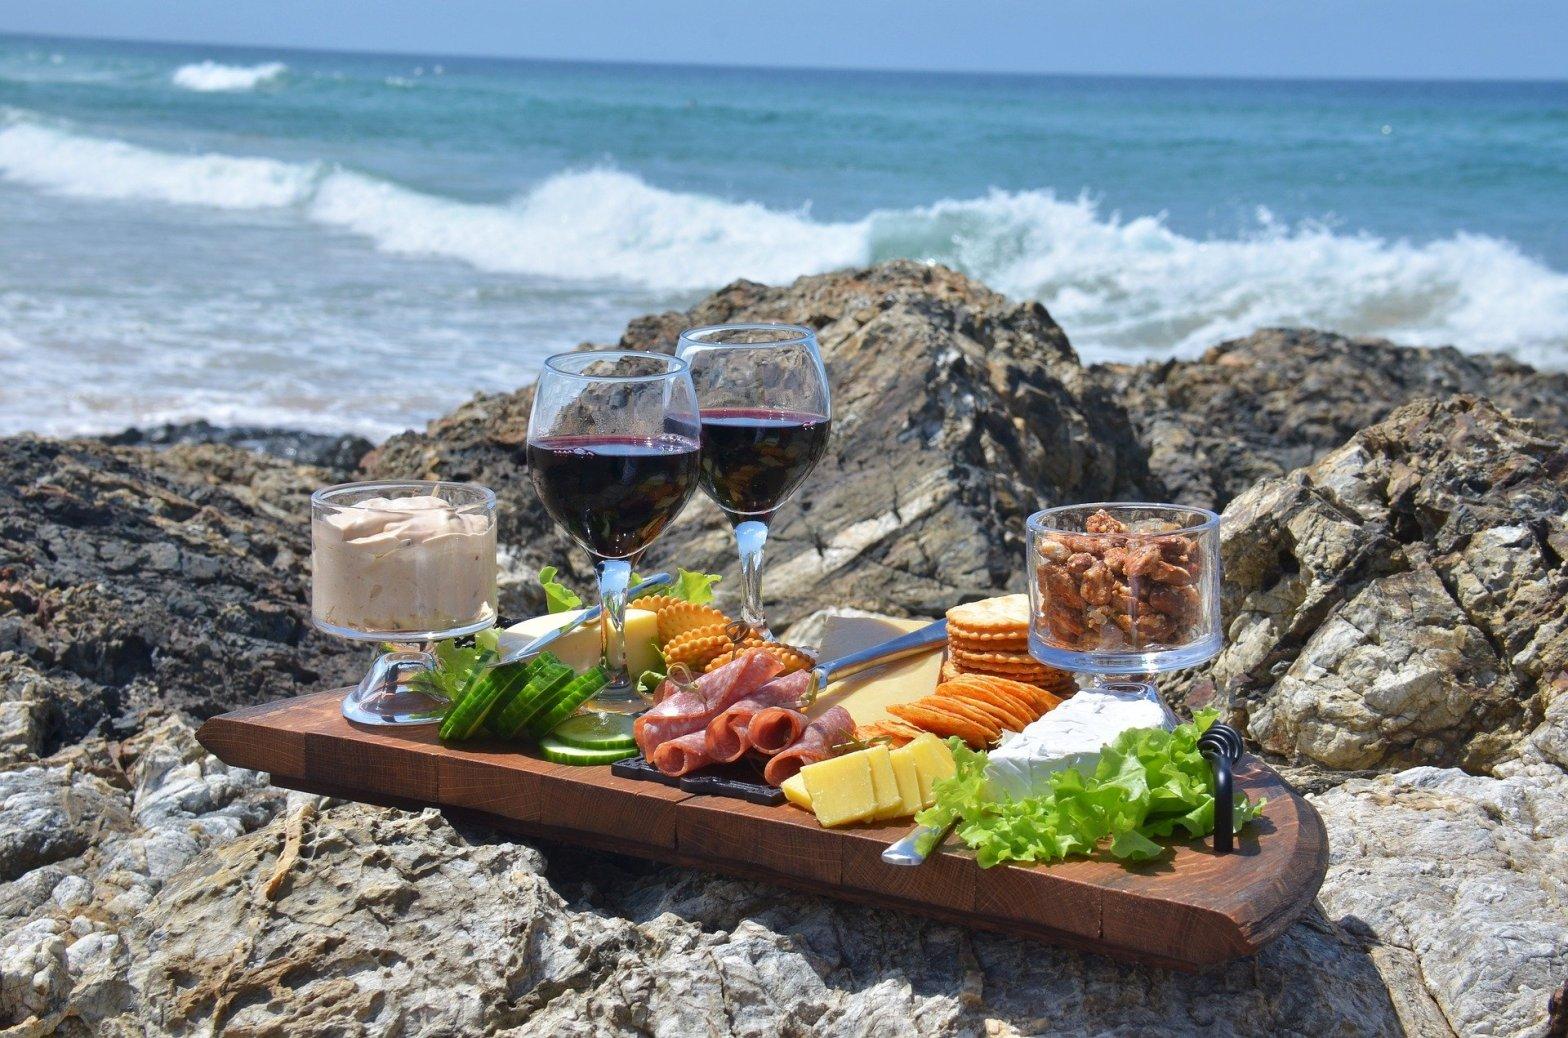 Canary Islands, Spanish wine region